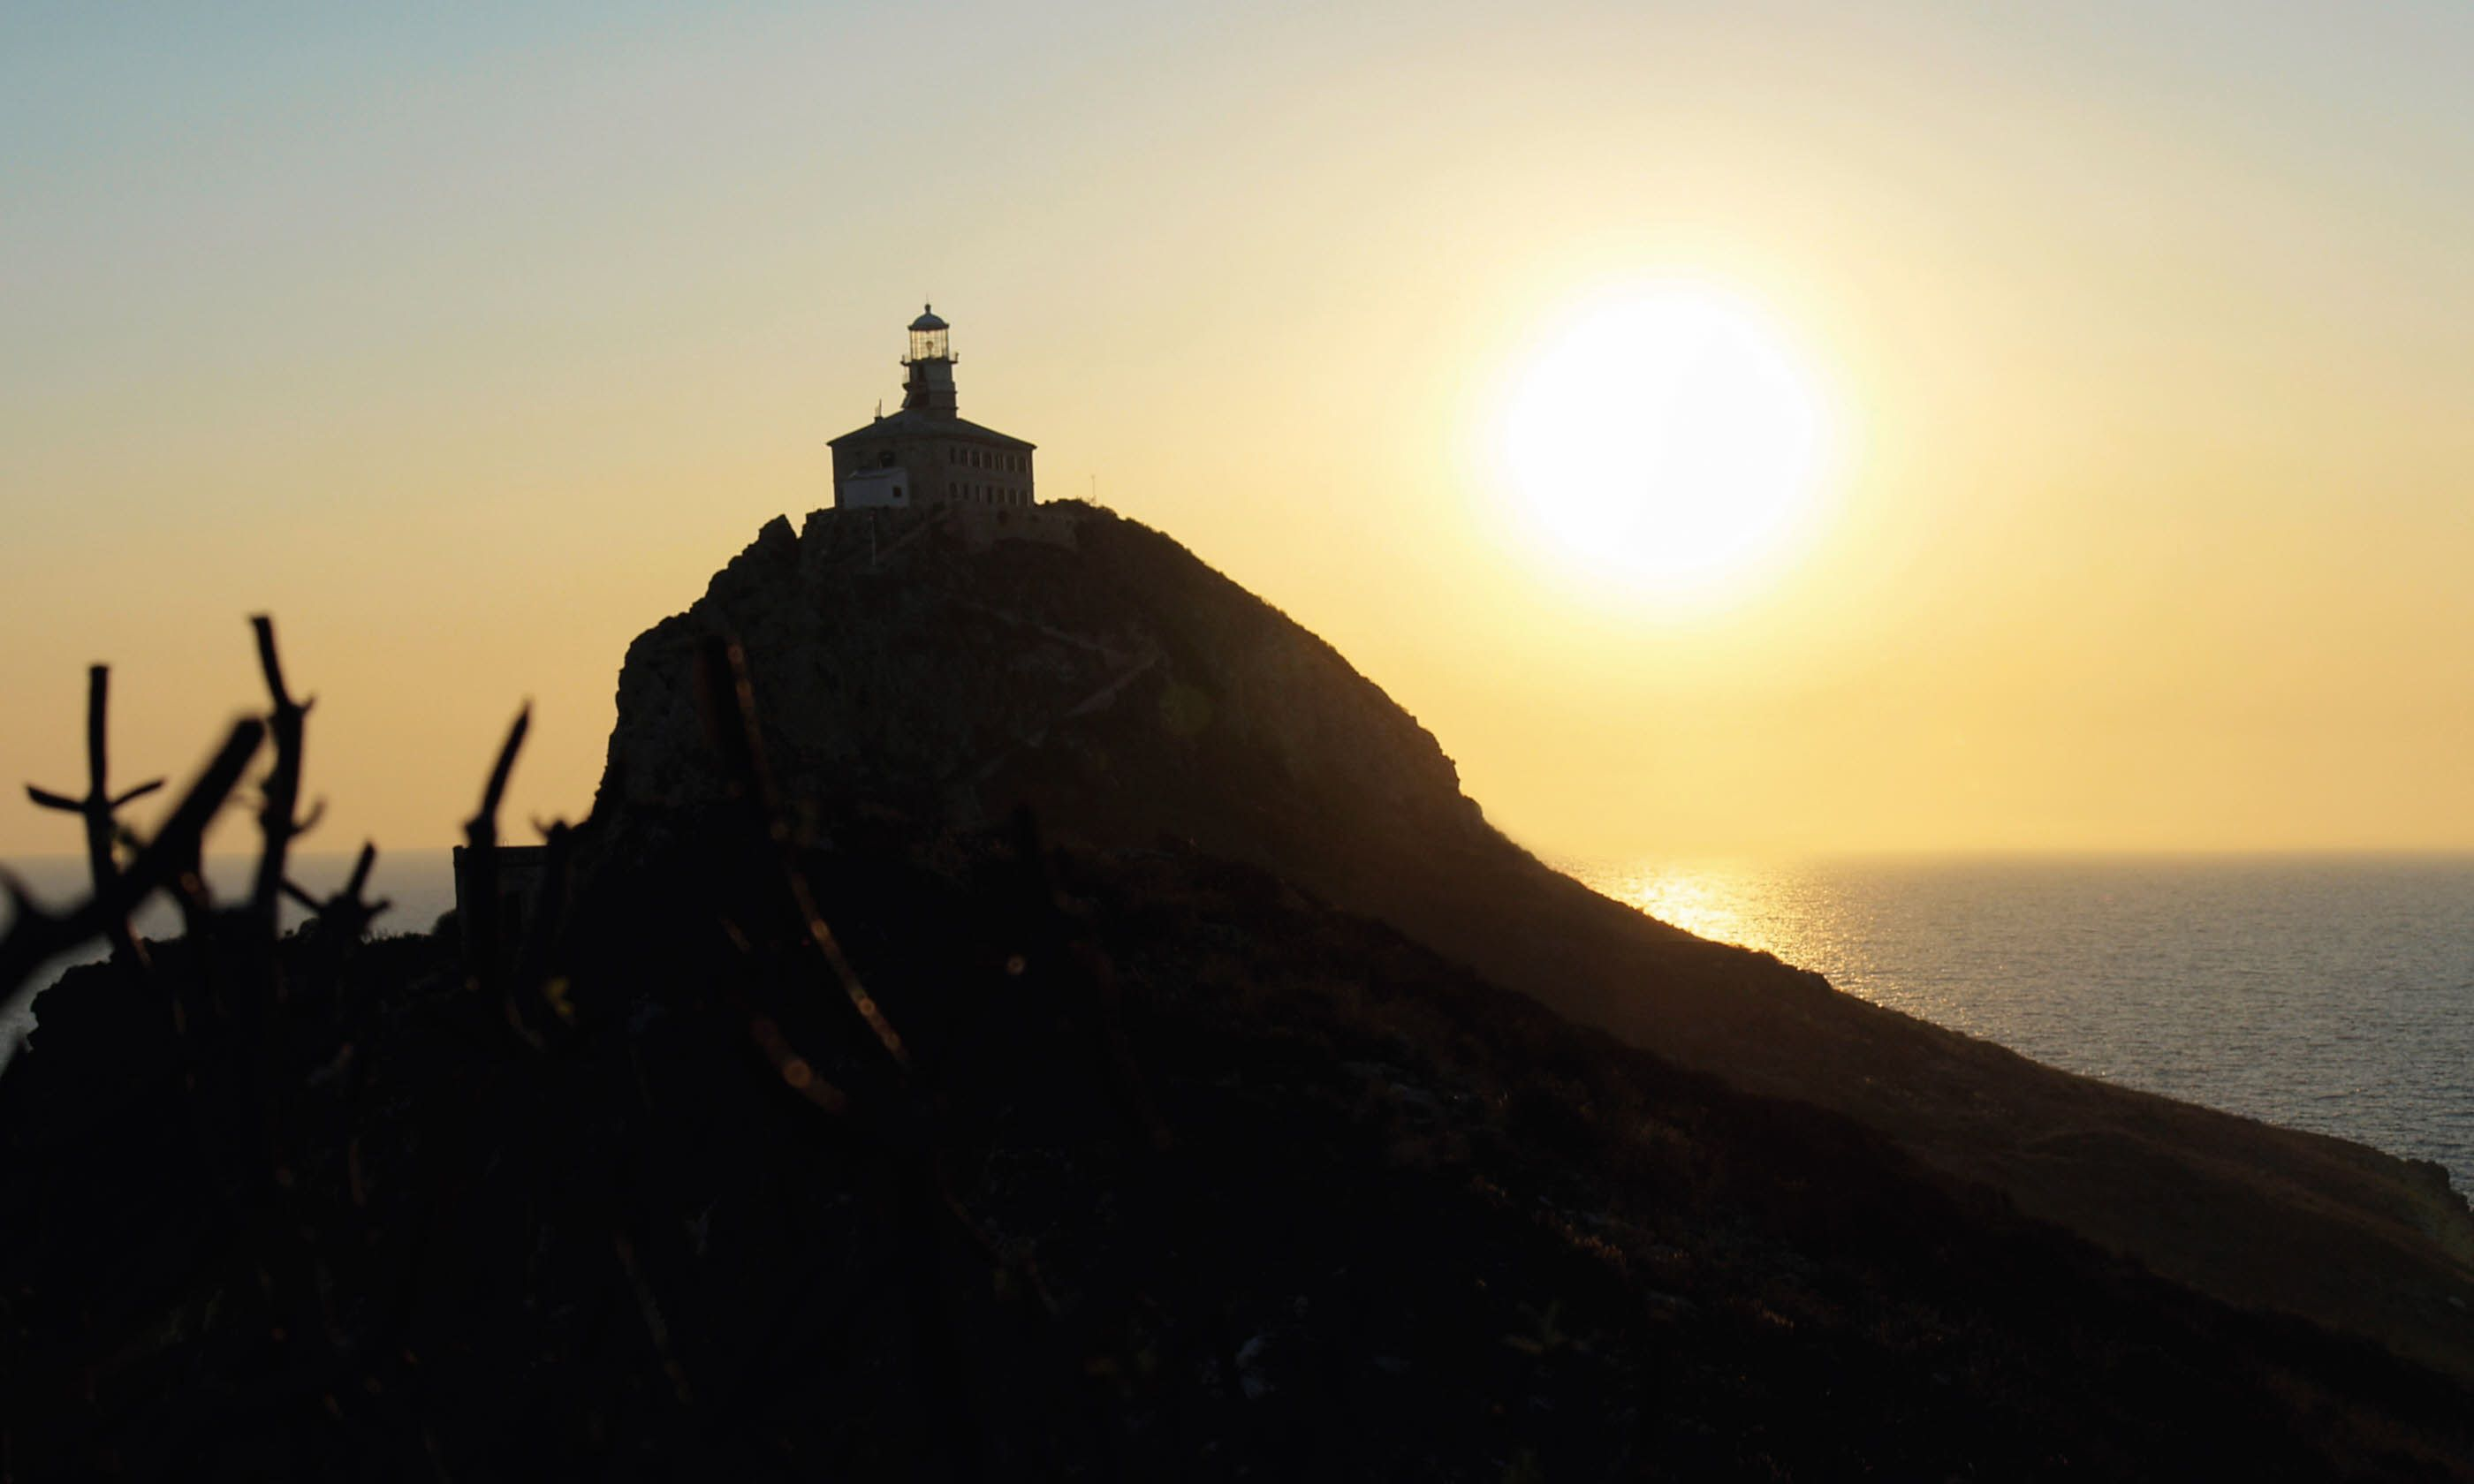 Palagruža Island (Dreamstime)